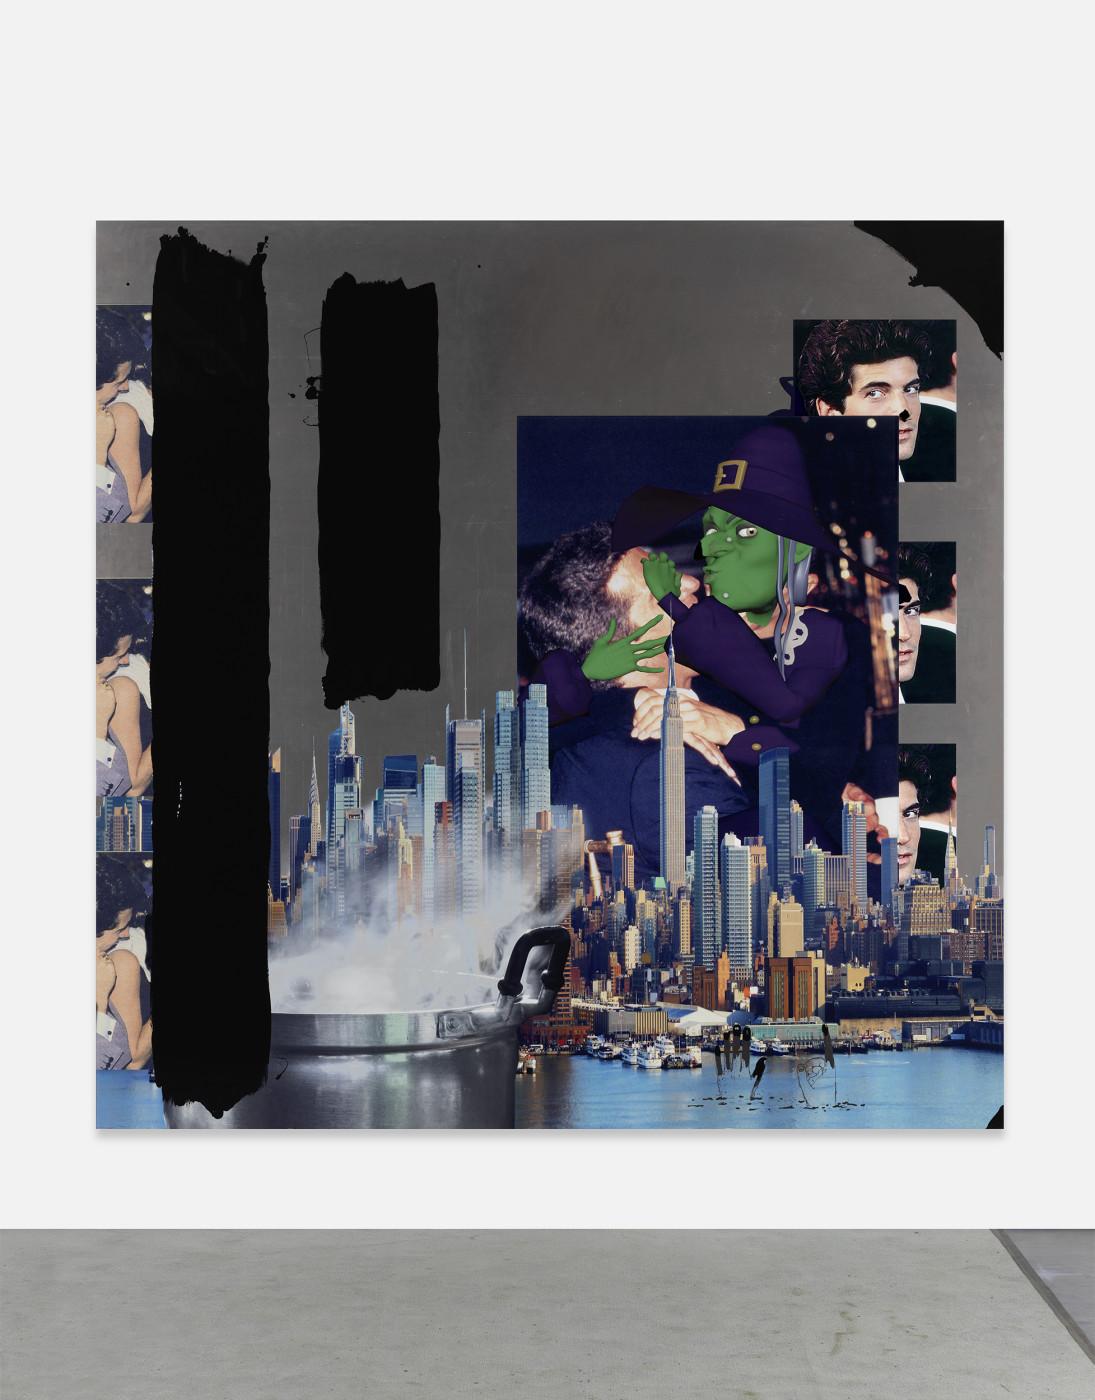 "<p><em>Untitled,</em> 2018<br />aluminum panel, 1/2"" hot rolled steel cleats, UV printed inks, gloss varnish, oil based gloss black enamel, black marker<br />213.4 x 213.4 x 2.2 cm / 84 x 84 x ⅞ in</p>"